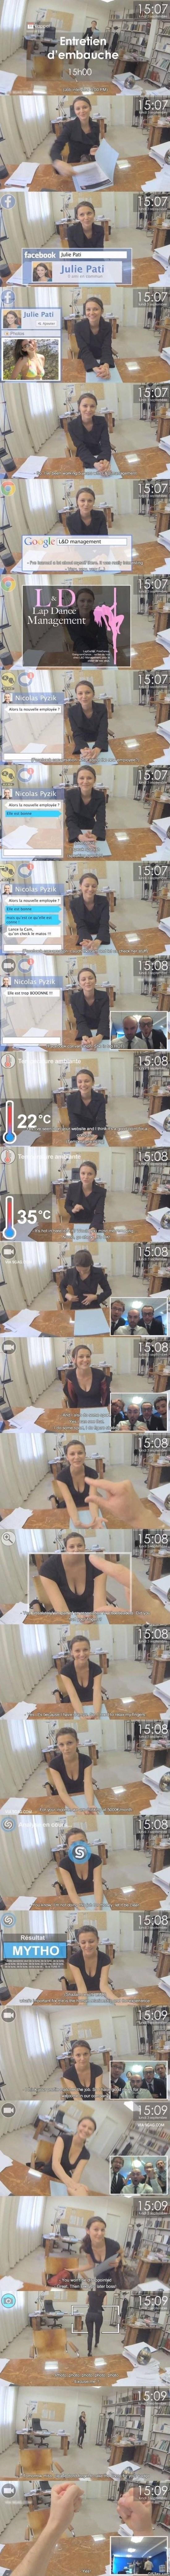 funny-google-glass-job-interview-2015